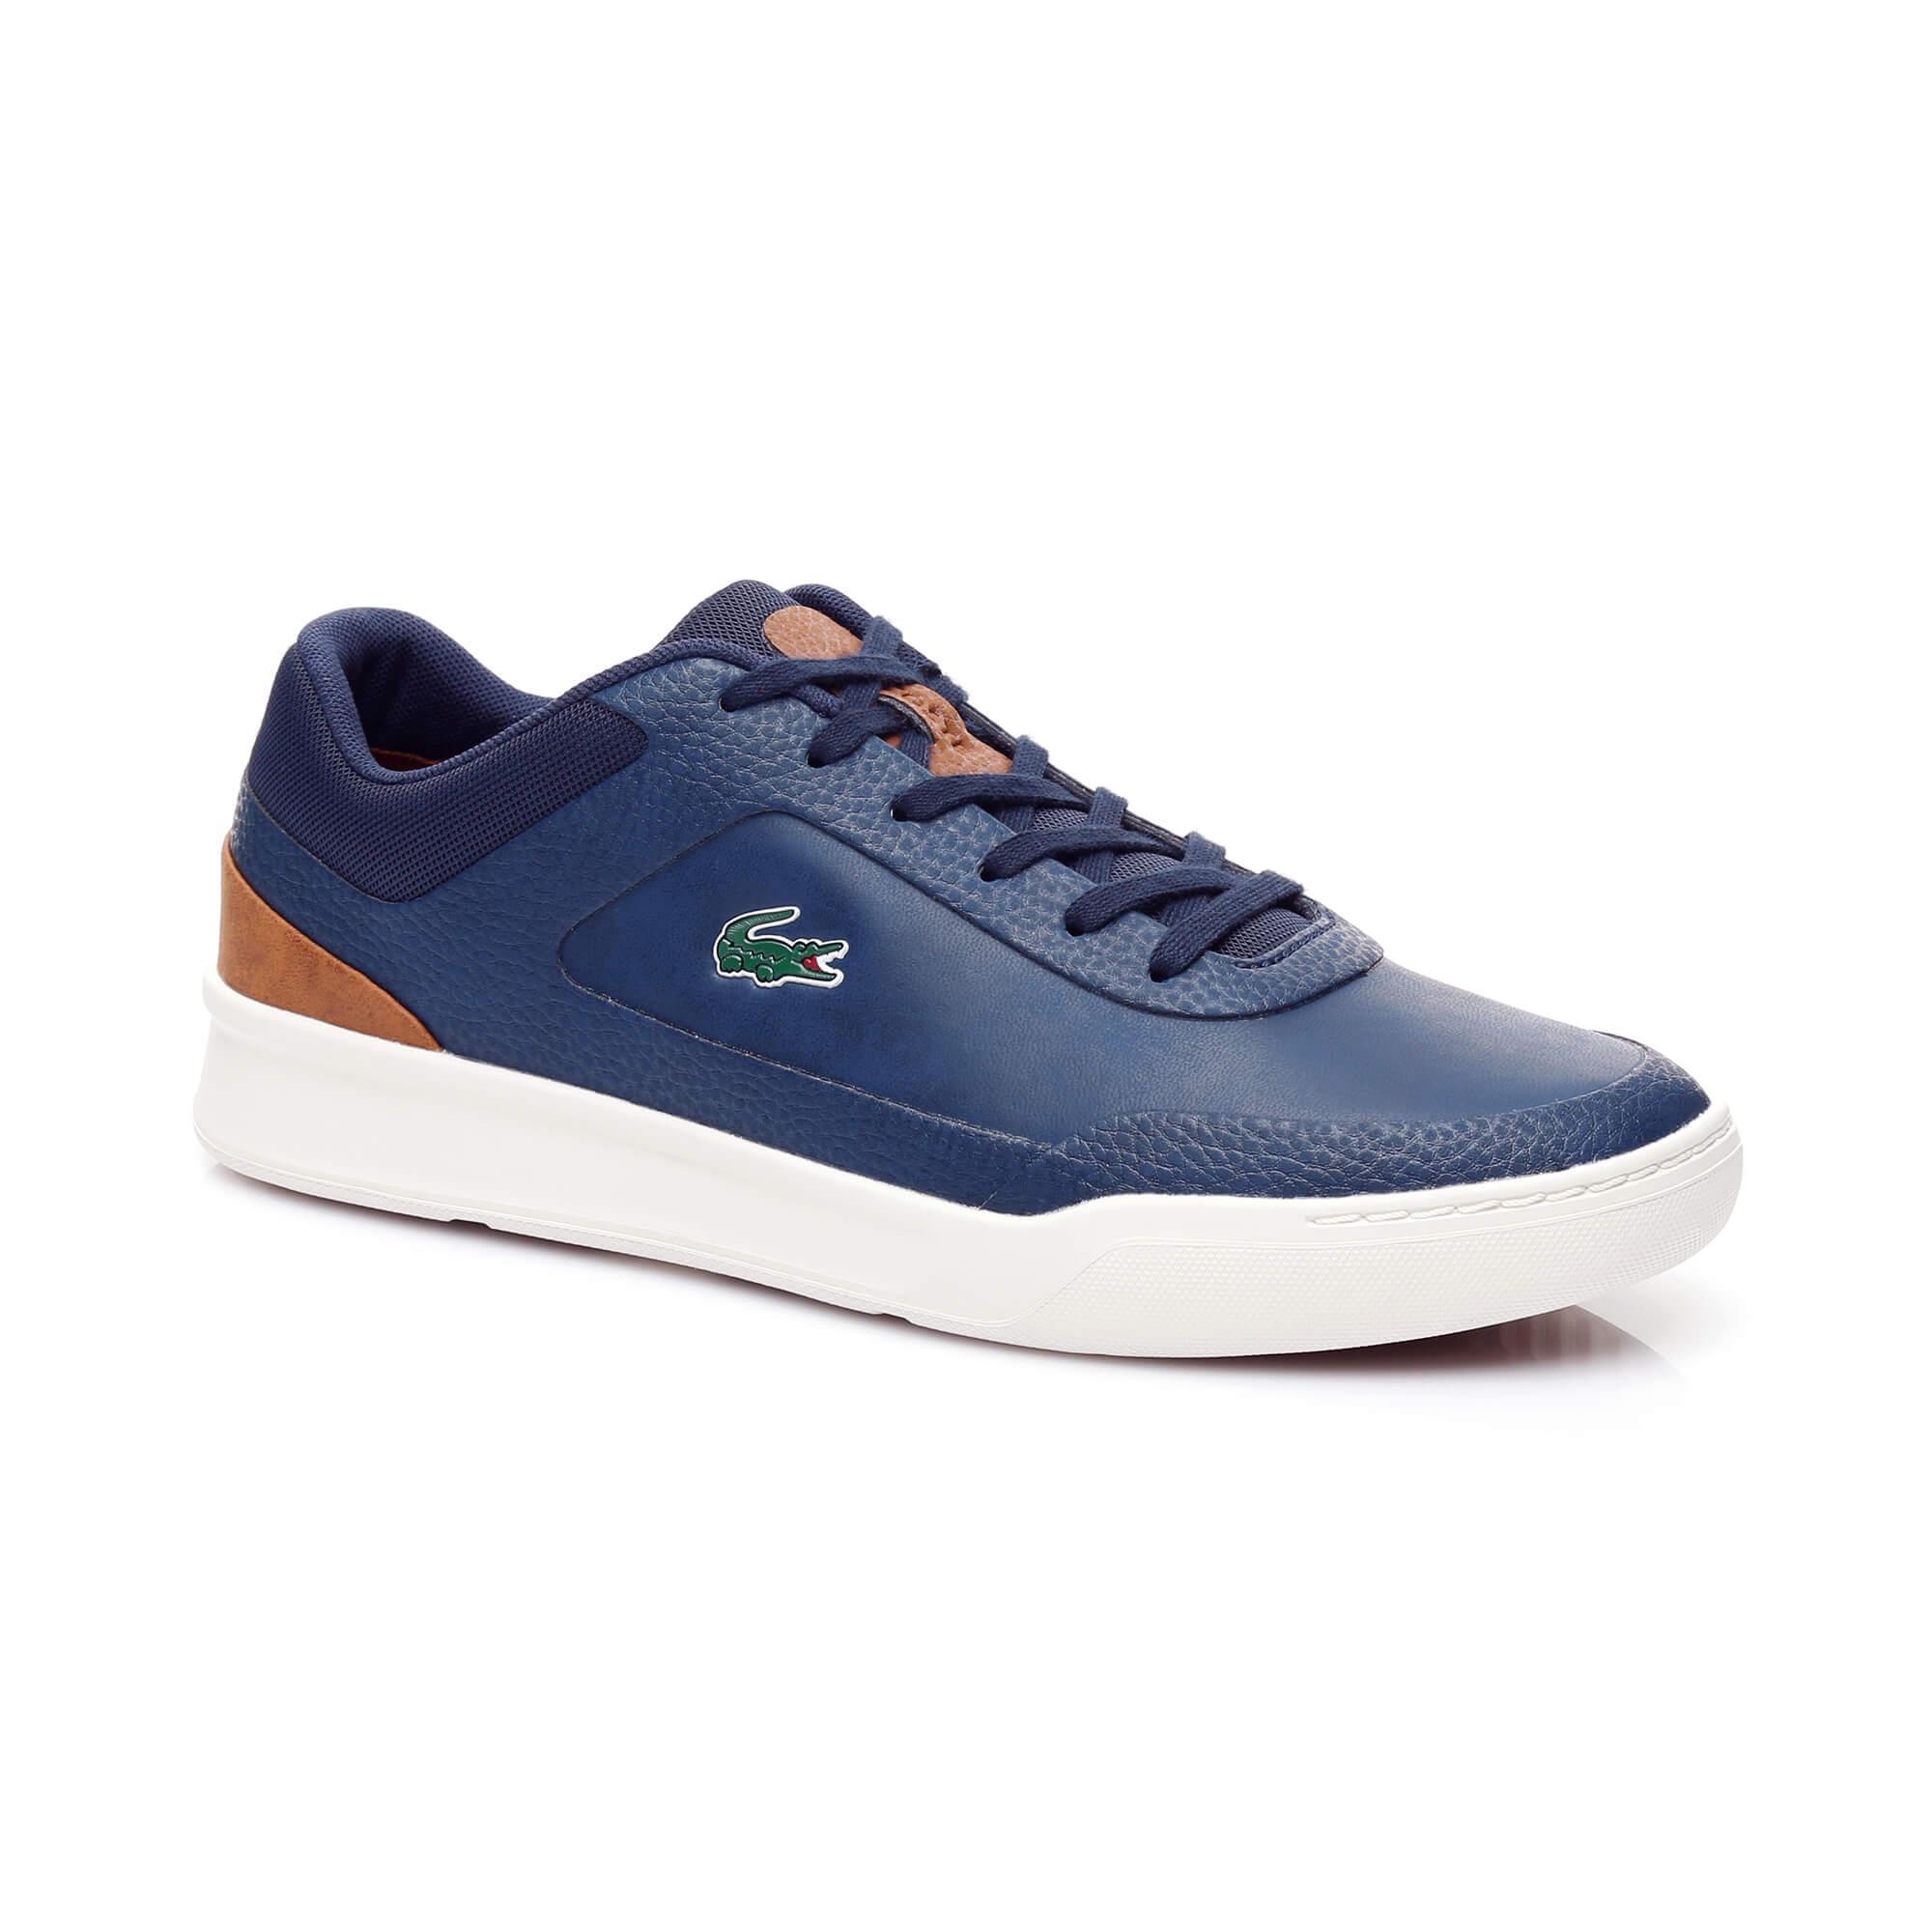 Lacoste Explorateur Sport LO 118 1 Męskie Sneakersy